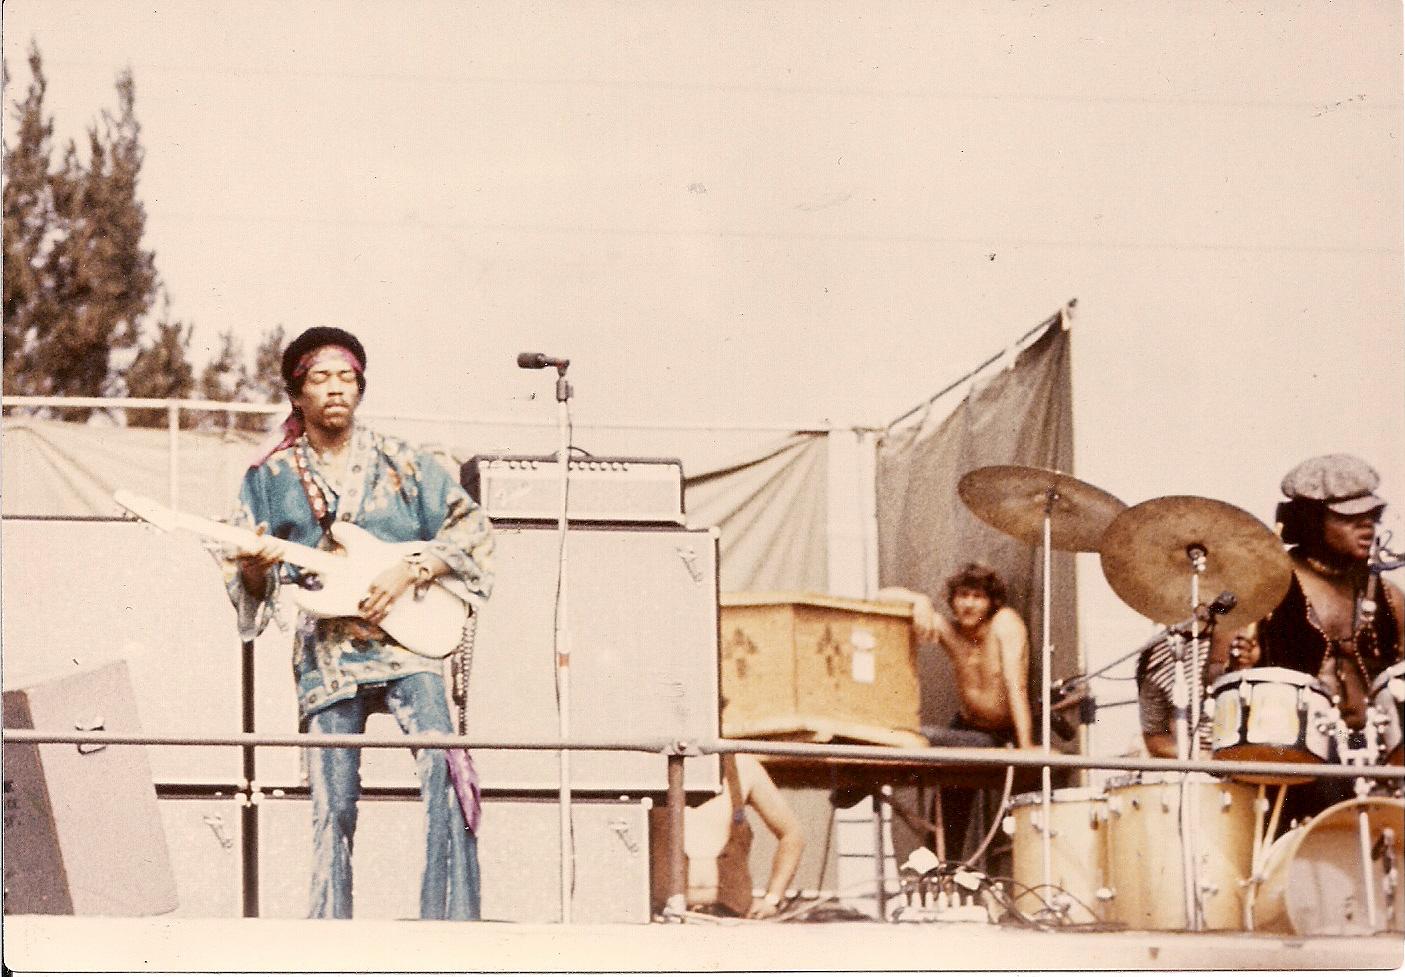 Devonshire Downs (Newport '69) : 22 juin 1969  210f8944918d4e14ee791f956019eb76